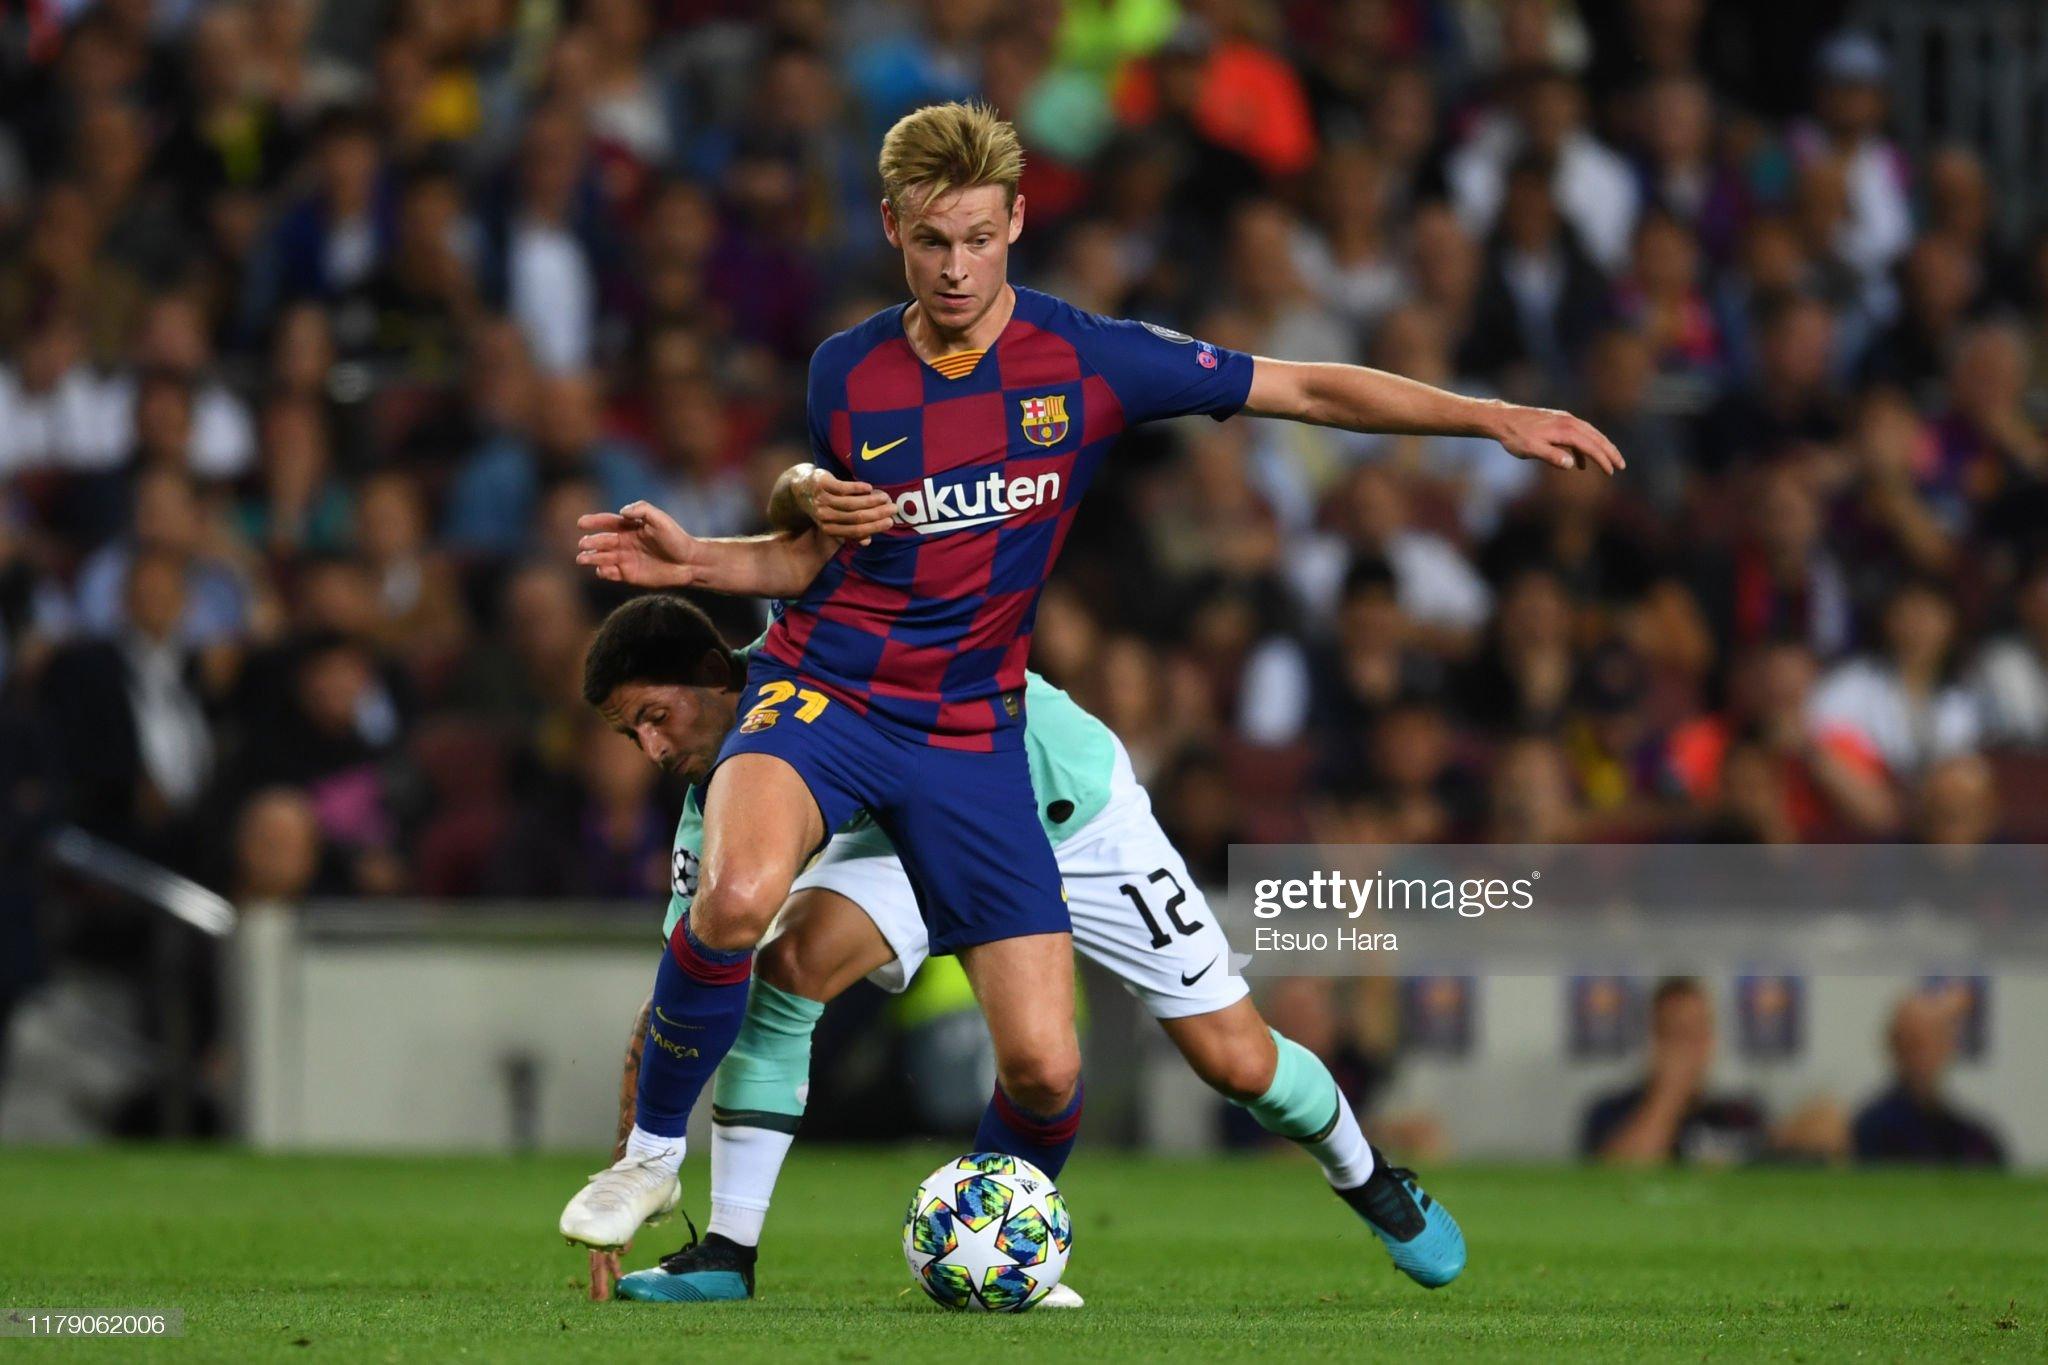 صور مباراة : برشلونة - إنتر 2-1 ( 02-10-2019 )  Frankie-de-jong-of-fc-barcelona-and-stefano-sensi-of-inter-compete-picture-id1179062006?s=2048x2048